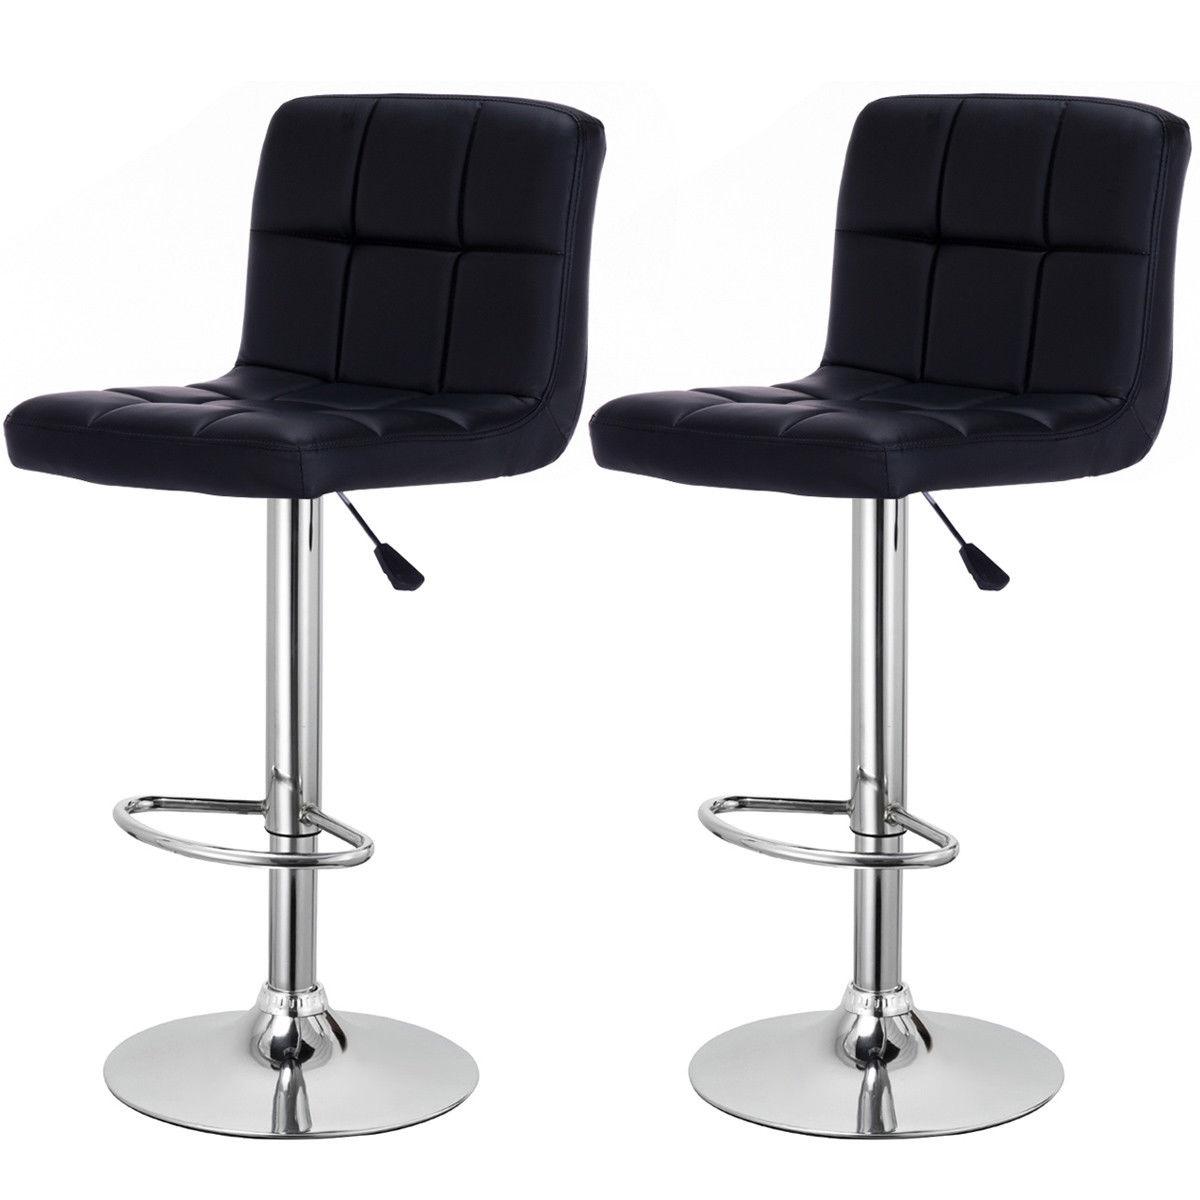 Zimtown Set Of 2 Adjustable Swivel Bar Stools PU Leather Pub Chairs